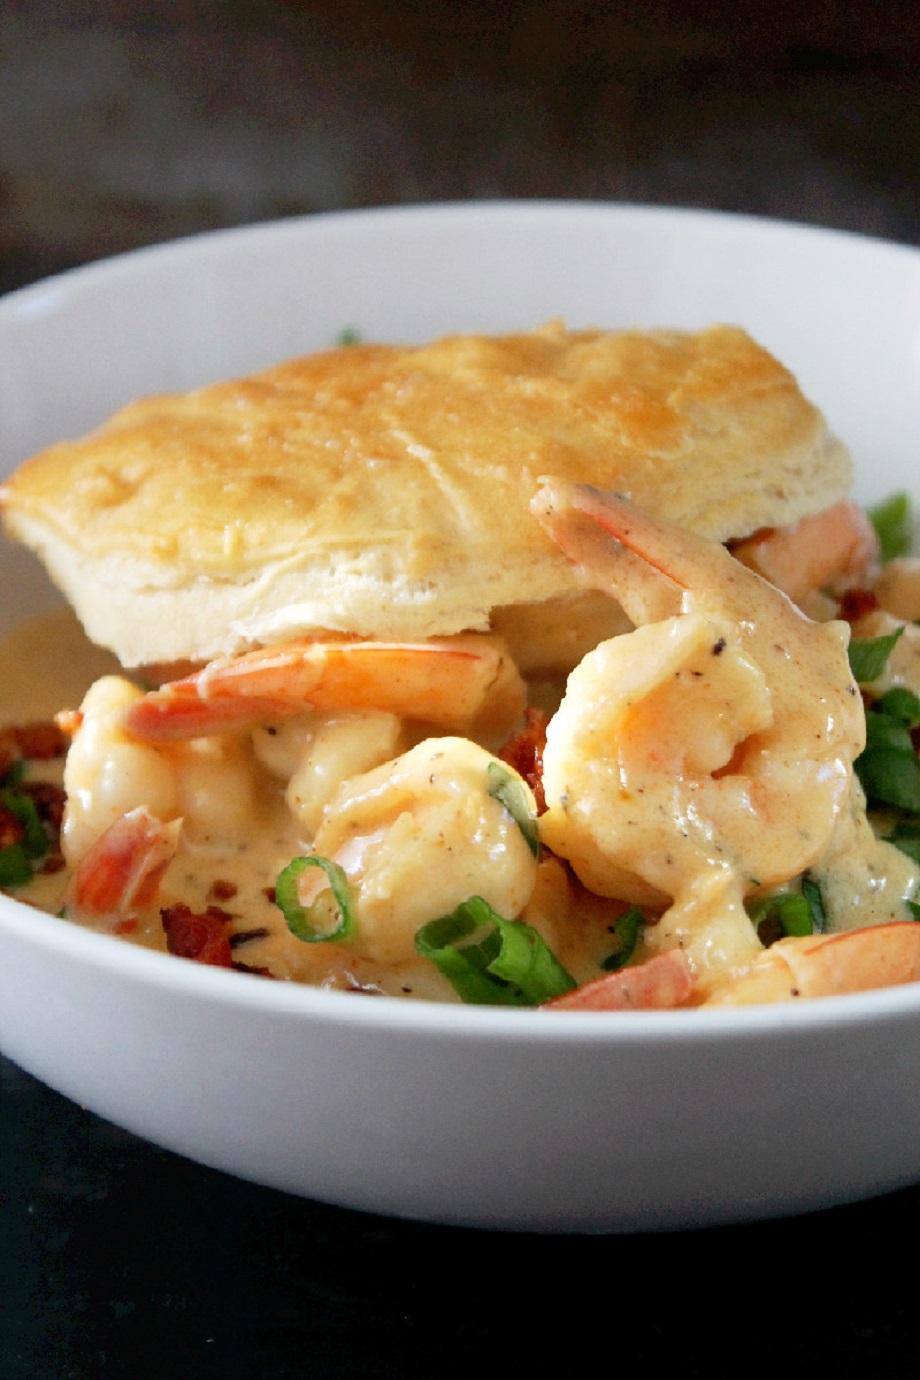 Cajun Shrimp and Biscuits